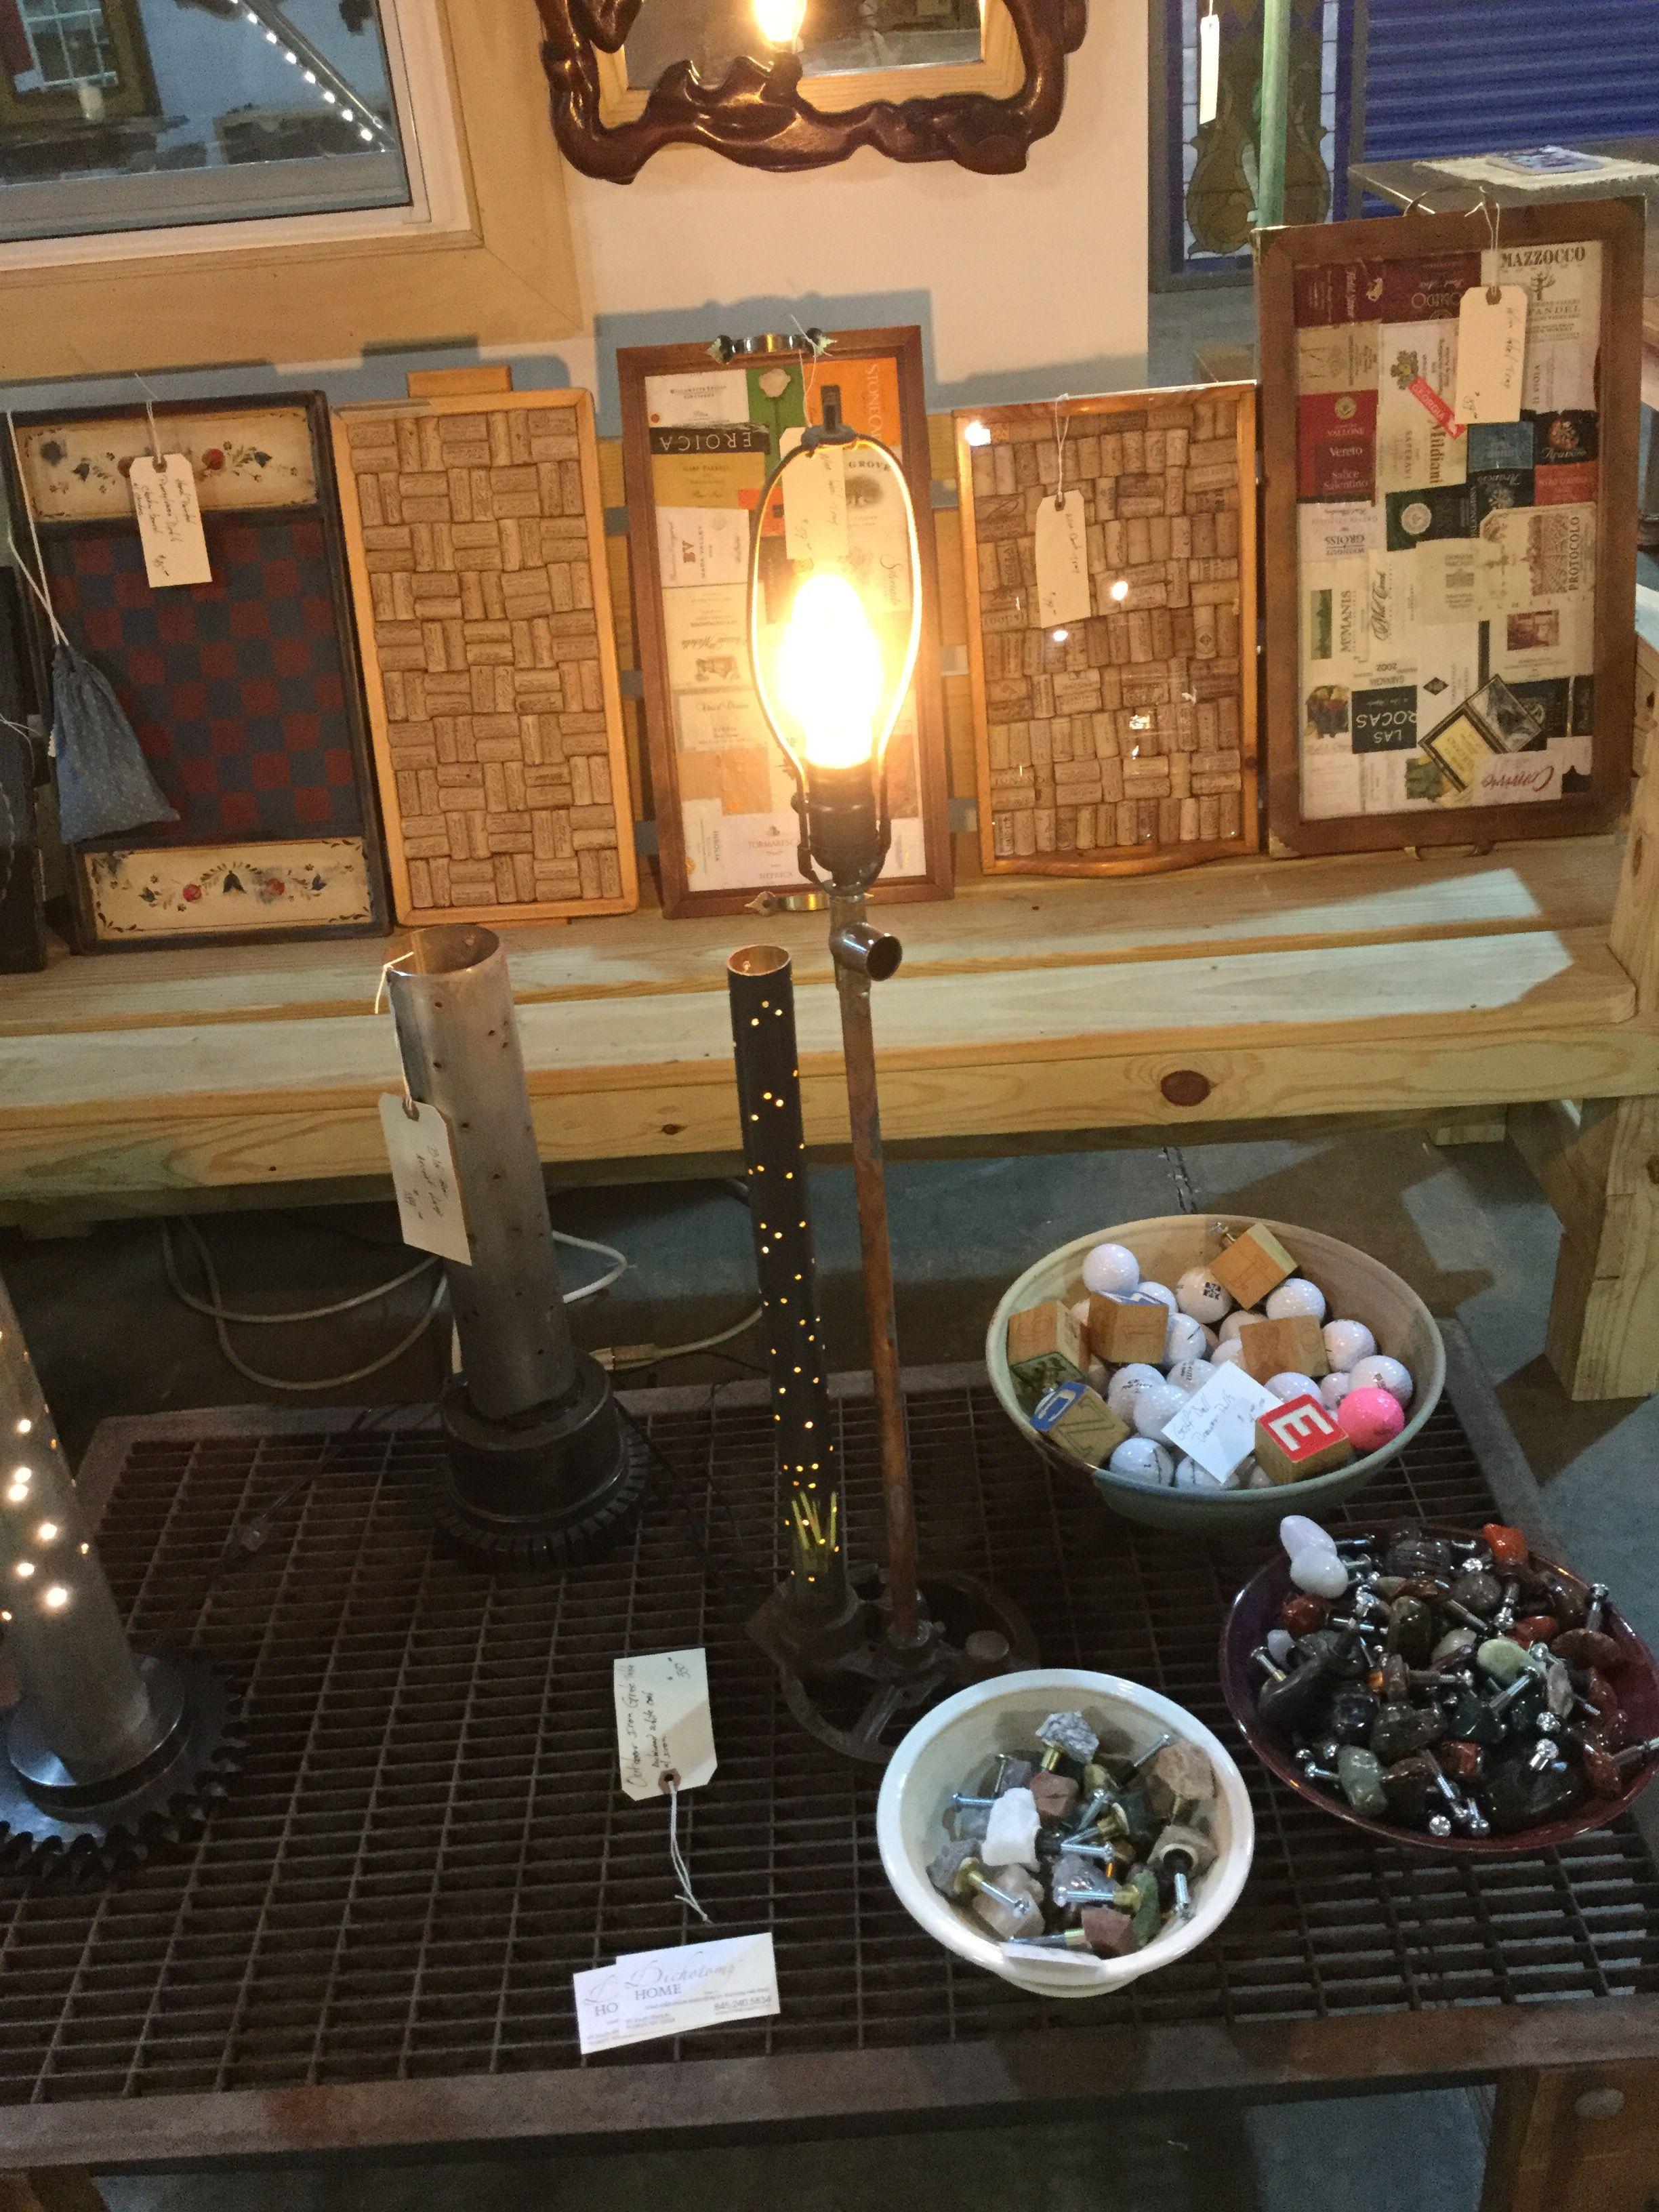 Industrial desk / accent lamp. LED. #chrisungaro.com #customlighting #hudsonvalleygalleries #handmadehudson #dichotomyhome